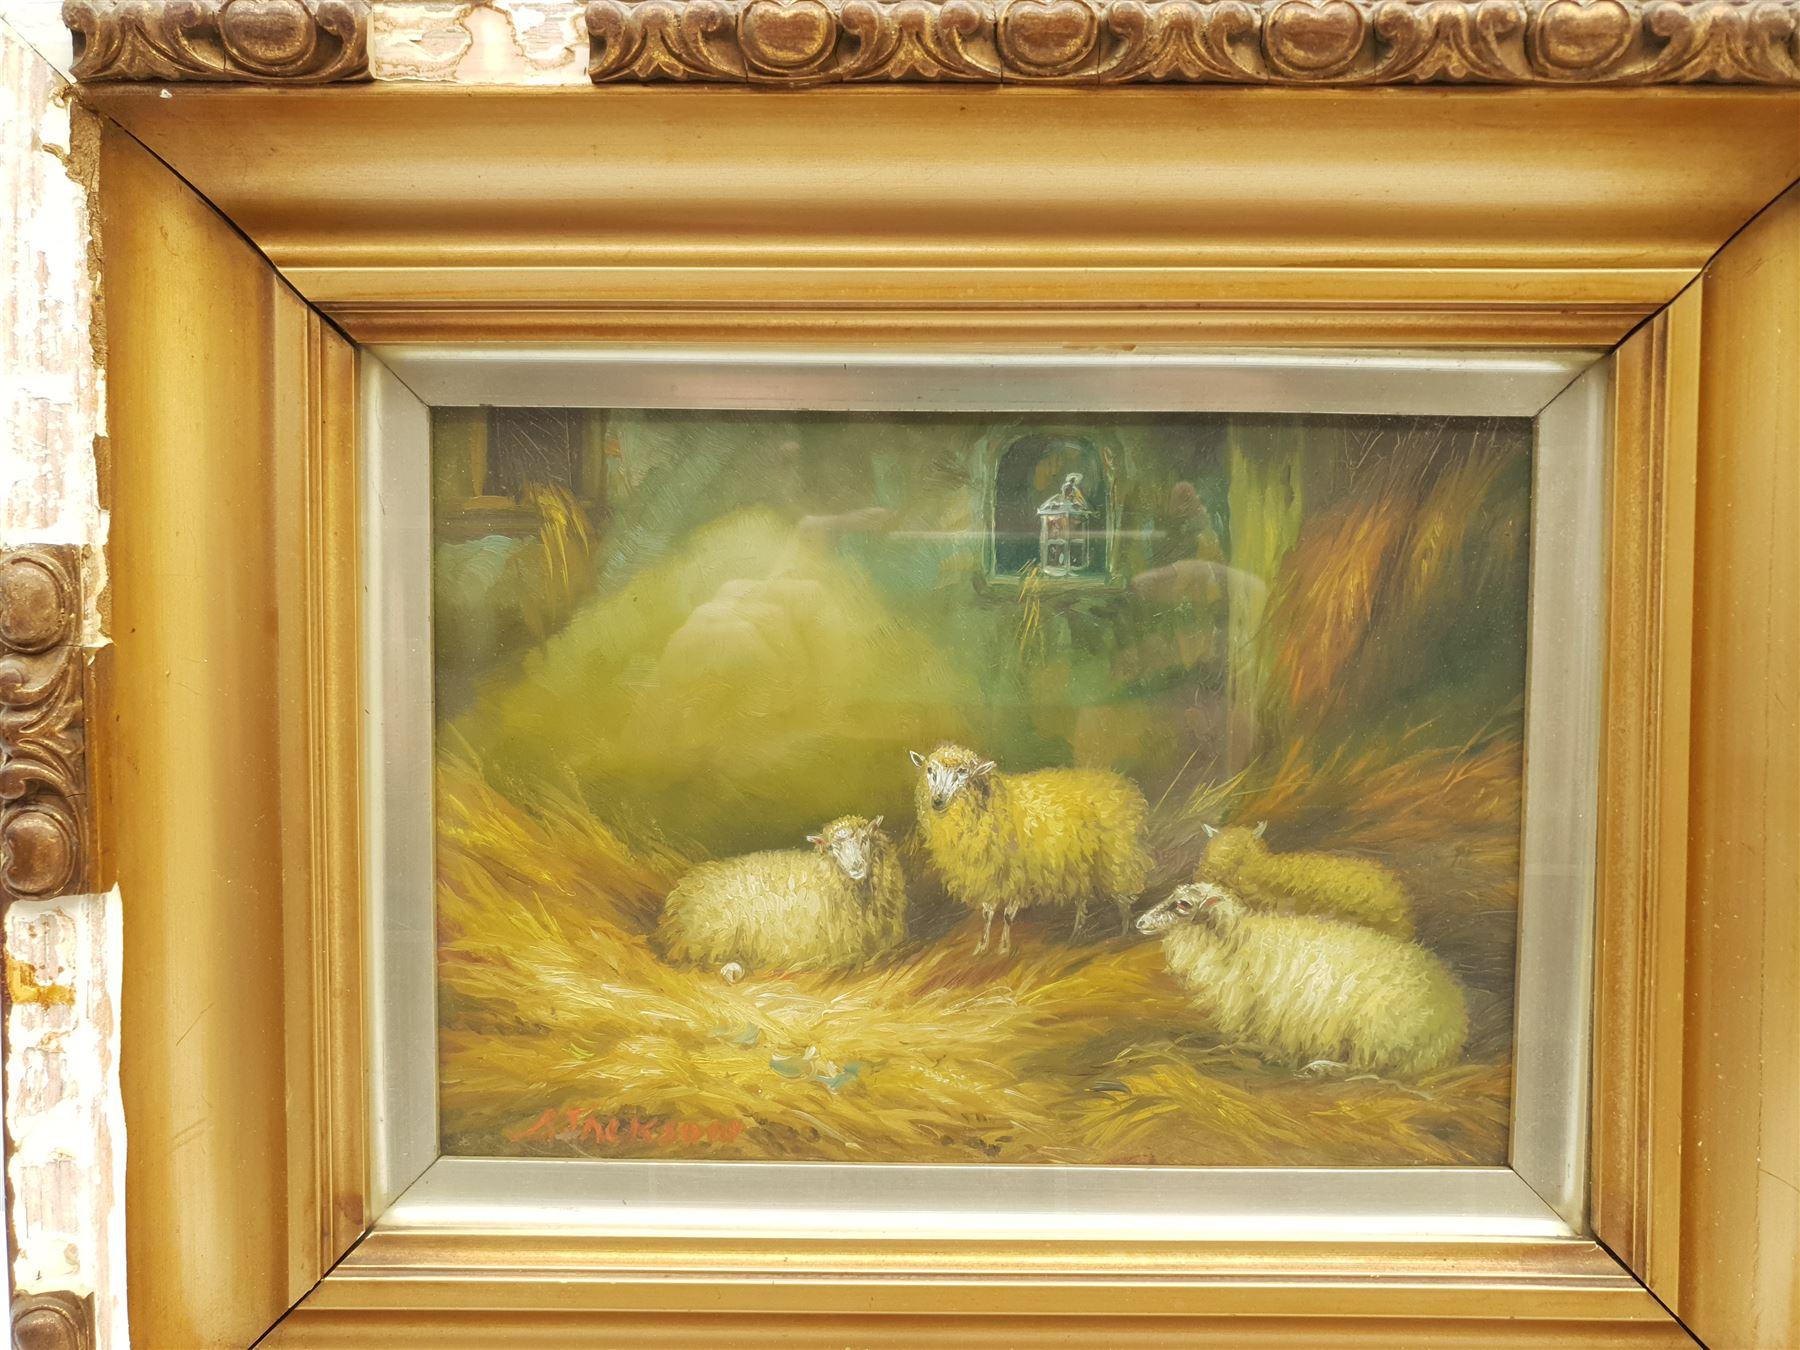 Arthur Jackson (British fl.1885-1910): Sheep in a Barn - Image 3 of 7